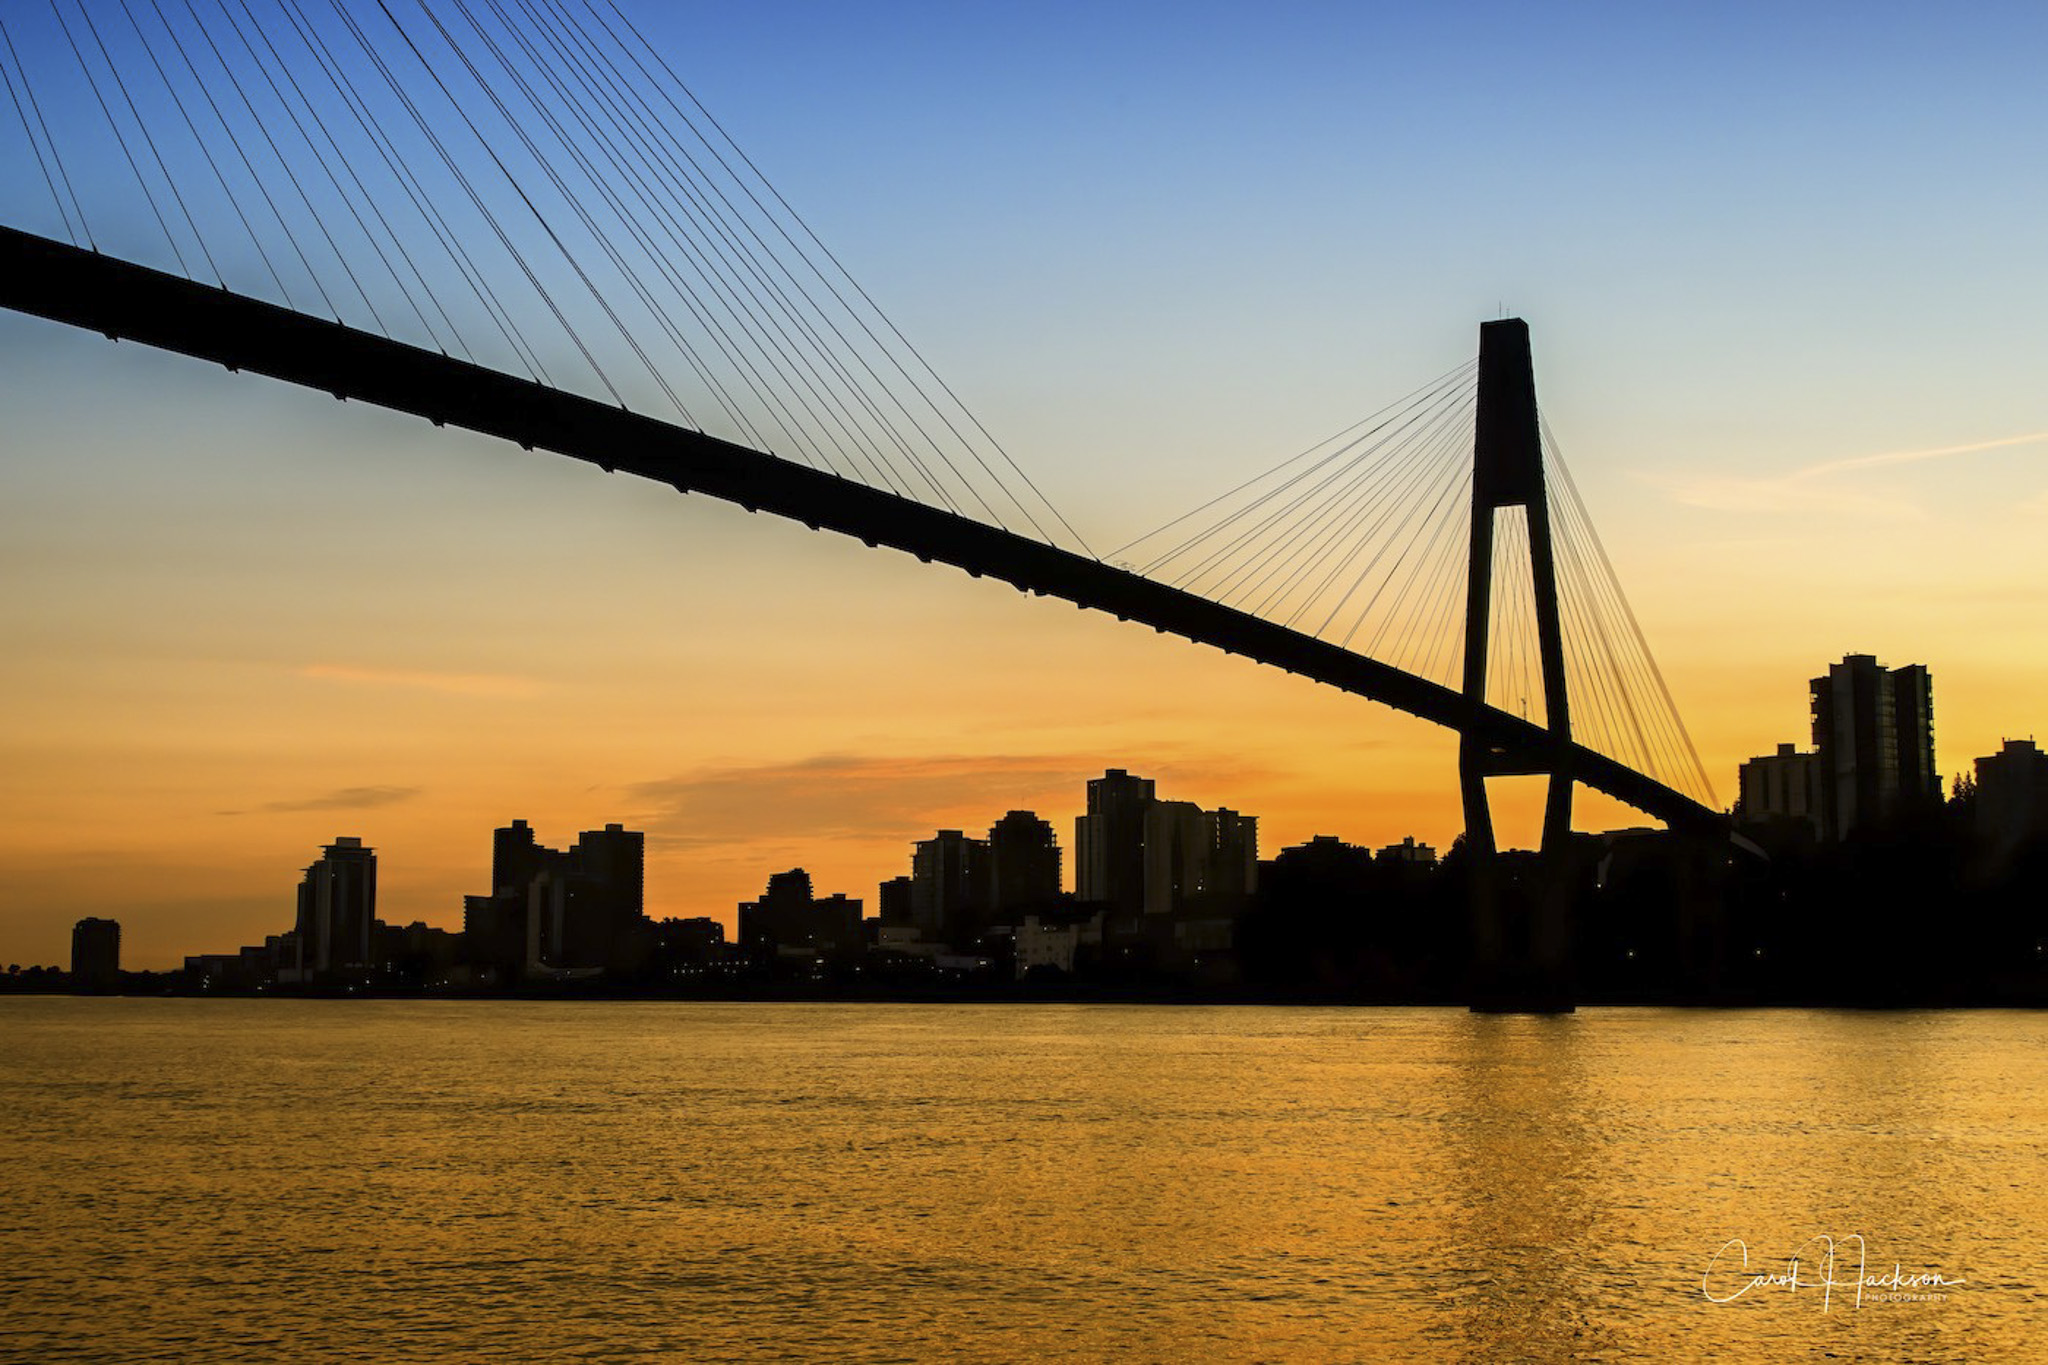 Sky Train Bridge Silhouette - Carol Jackson